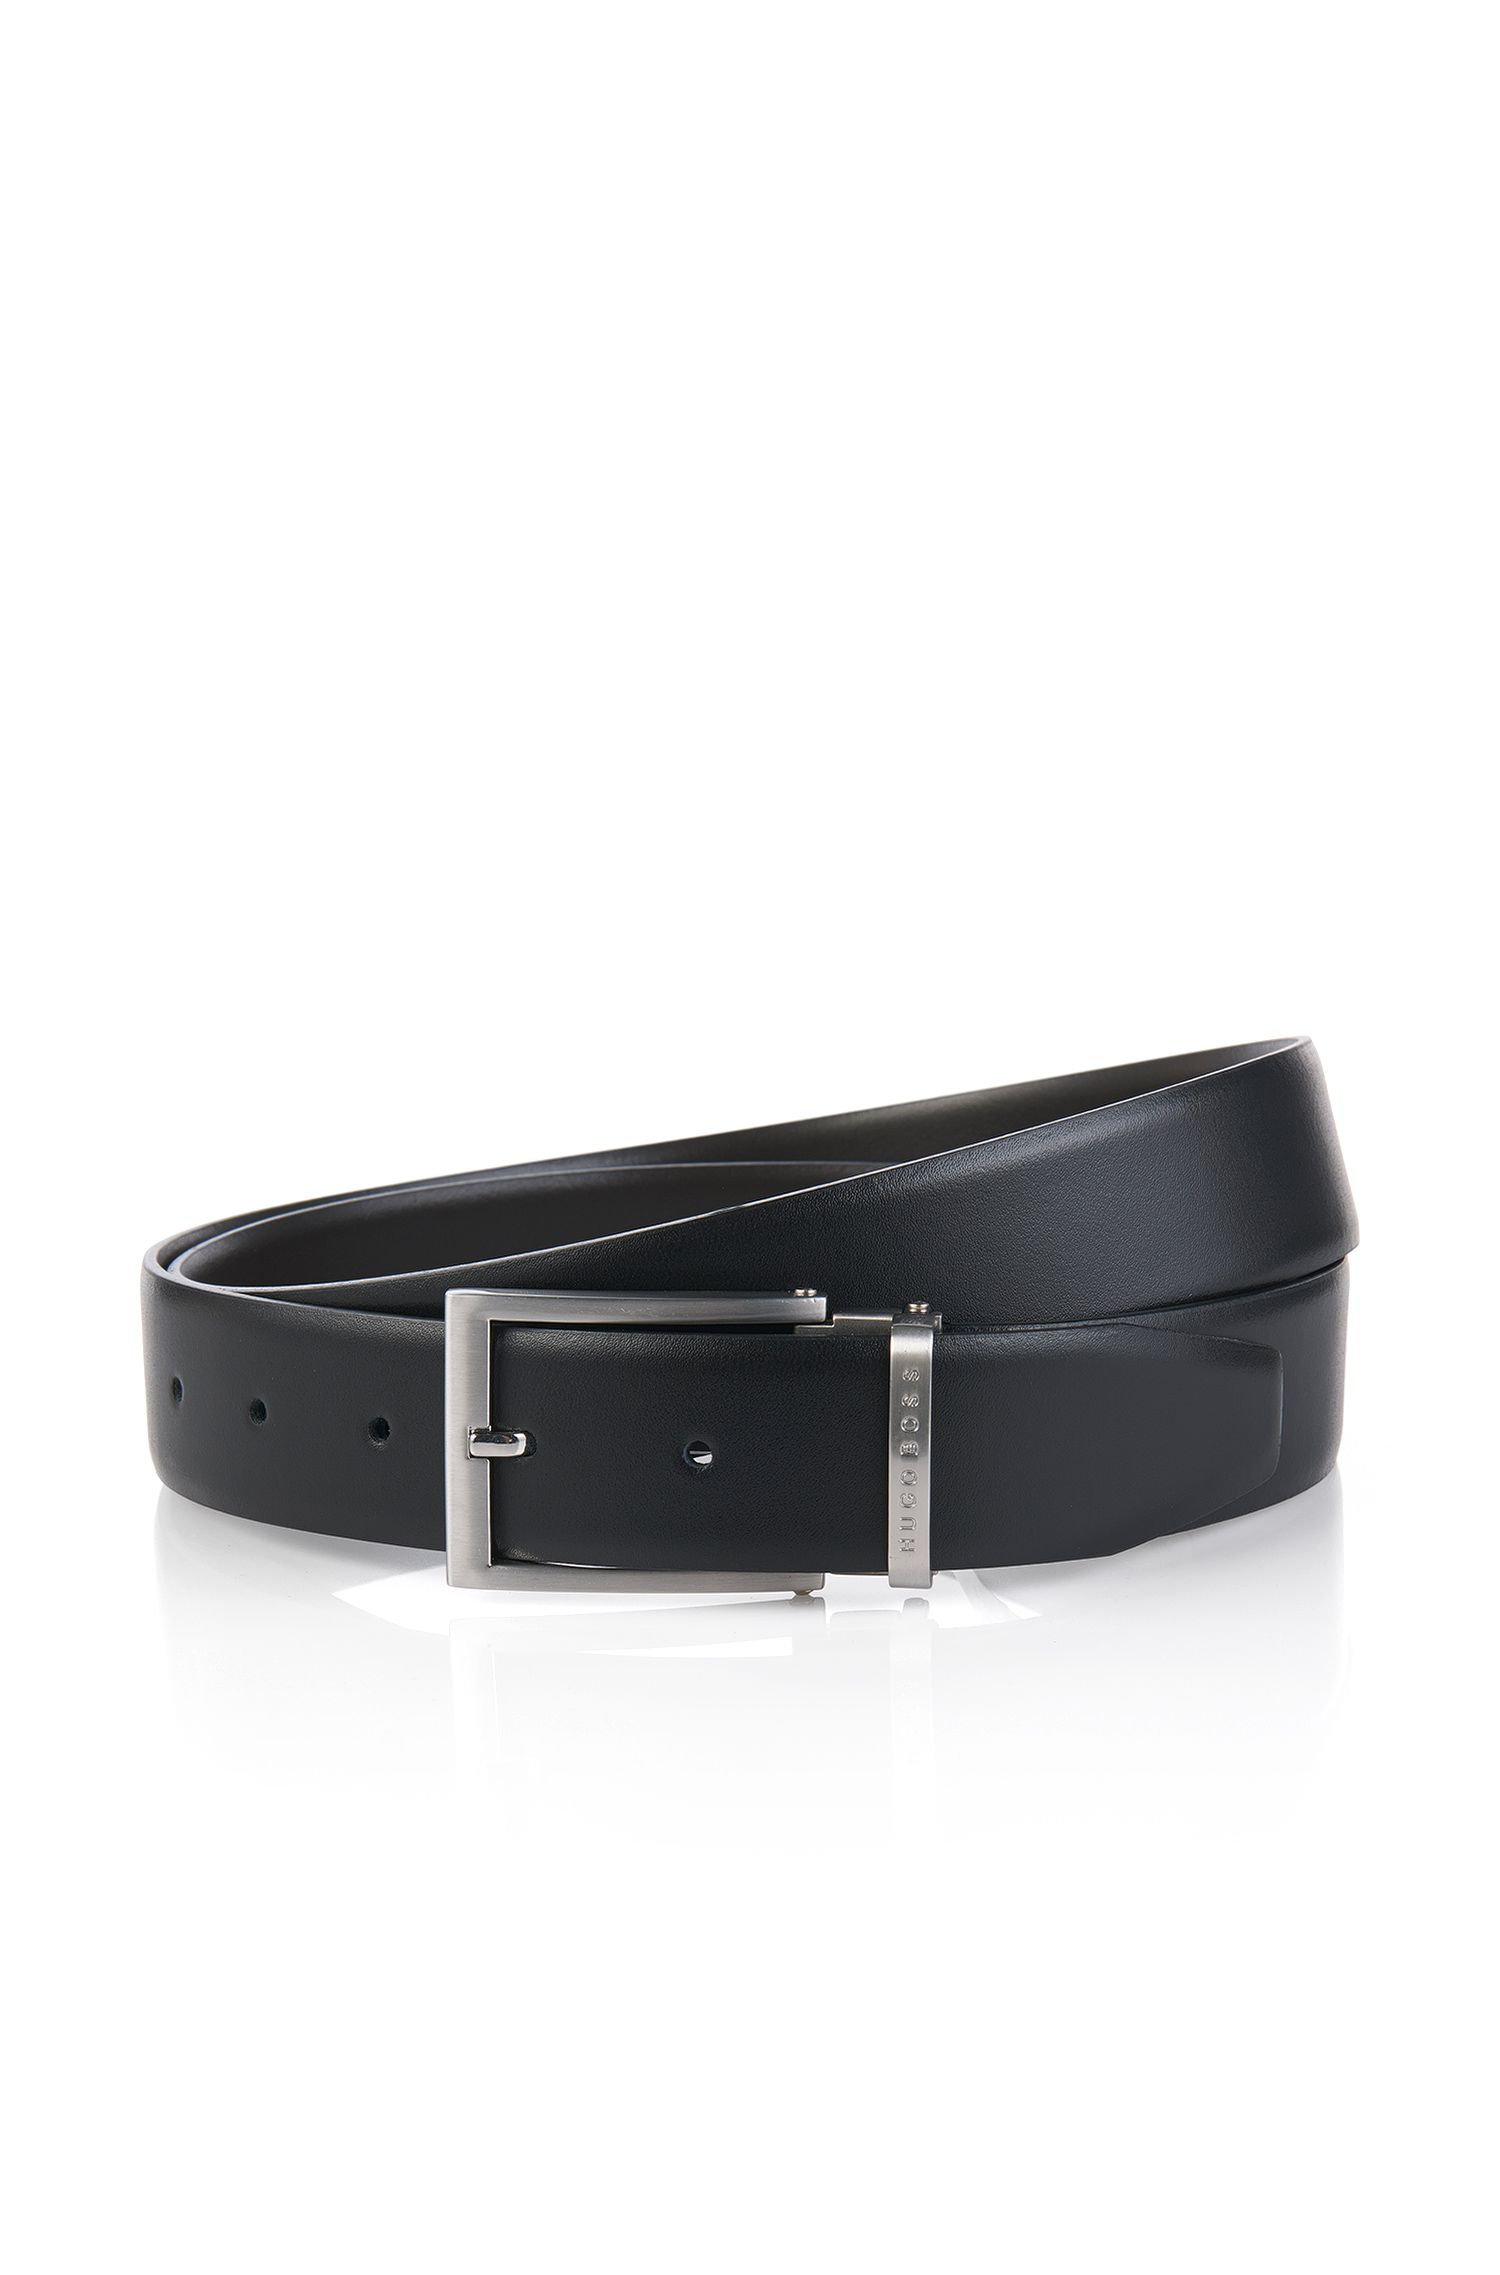 'OLARIO-CN' | Leather Reversible Belt